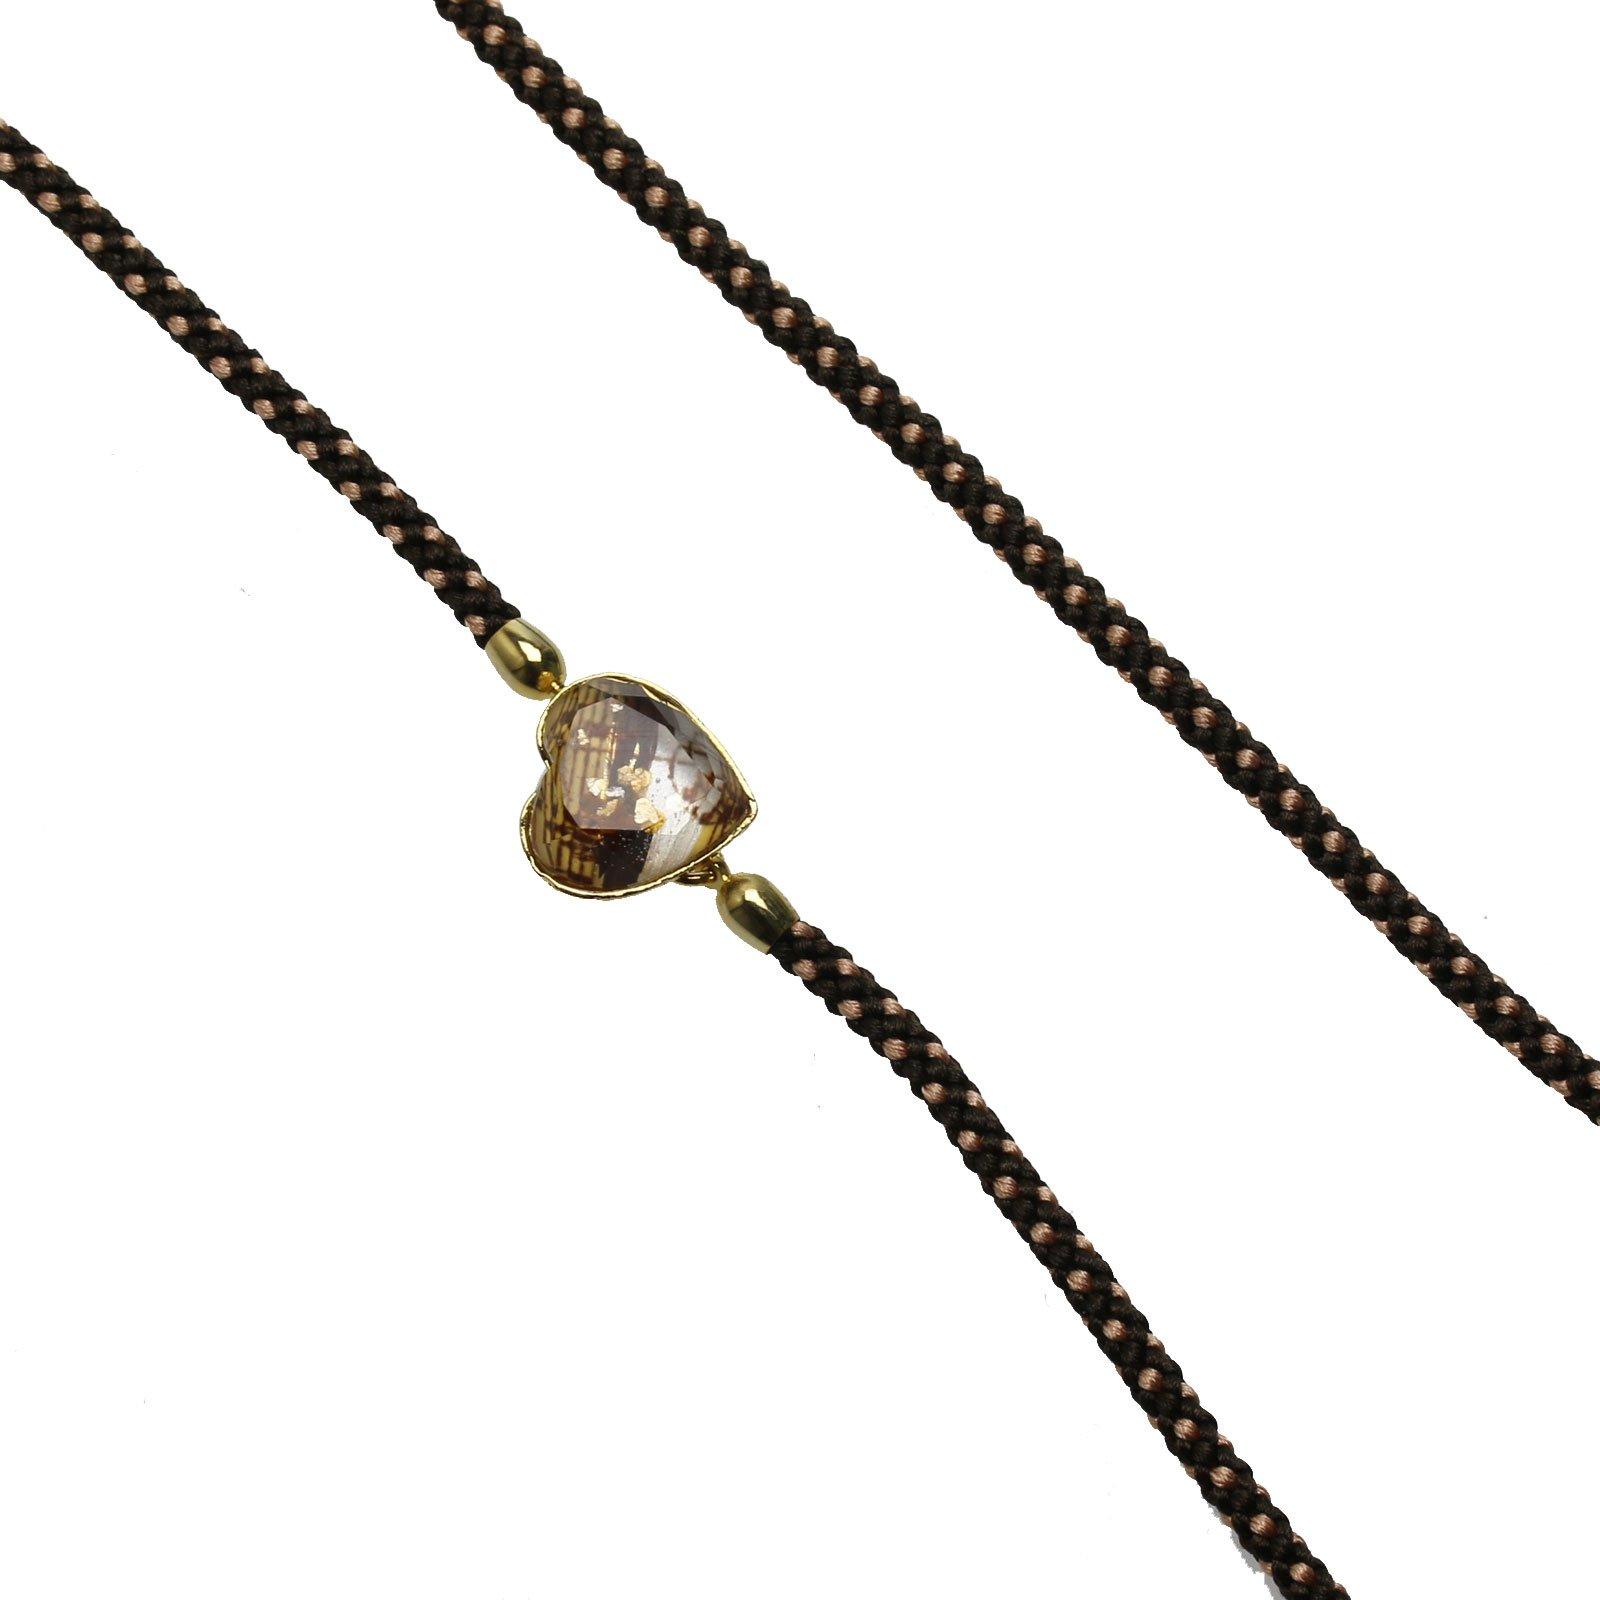 Tamarusan Glass Code Glasses Chain Braid Silk Heart Note Eyeglasses Strap